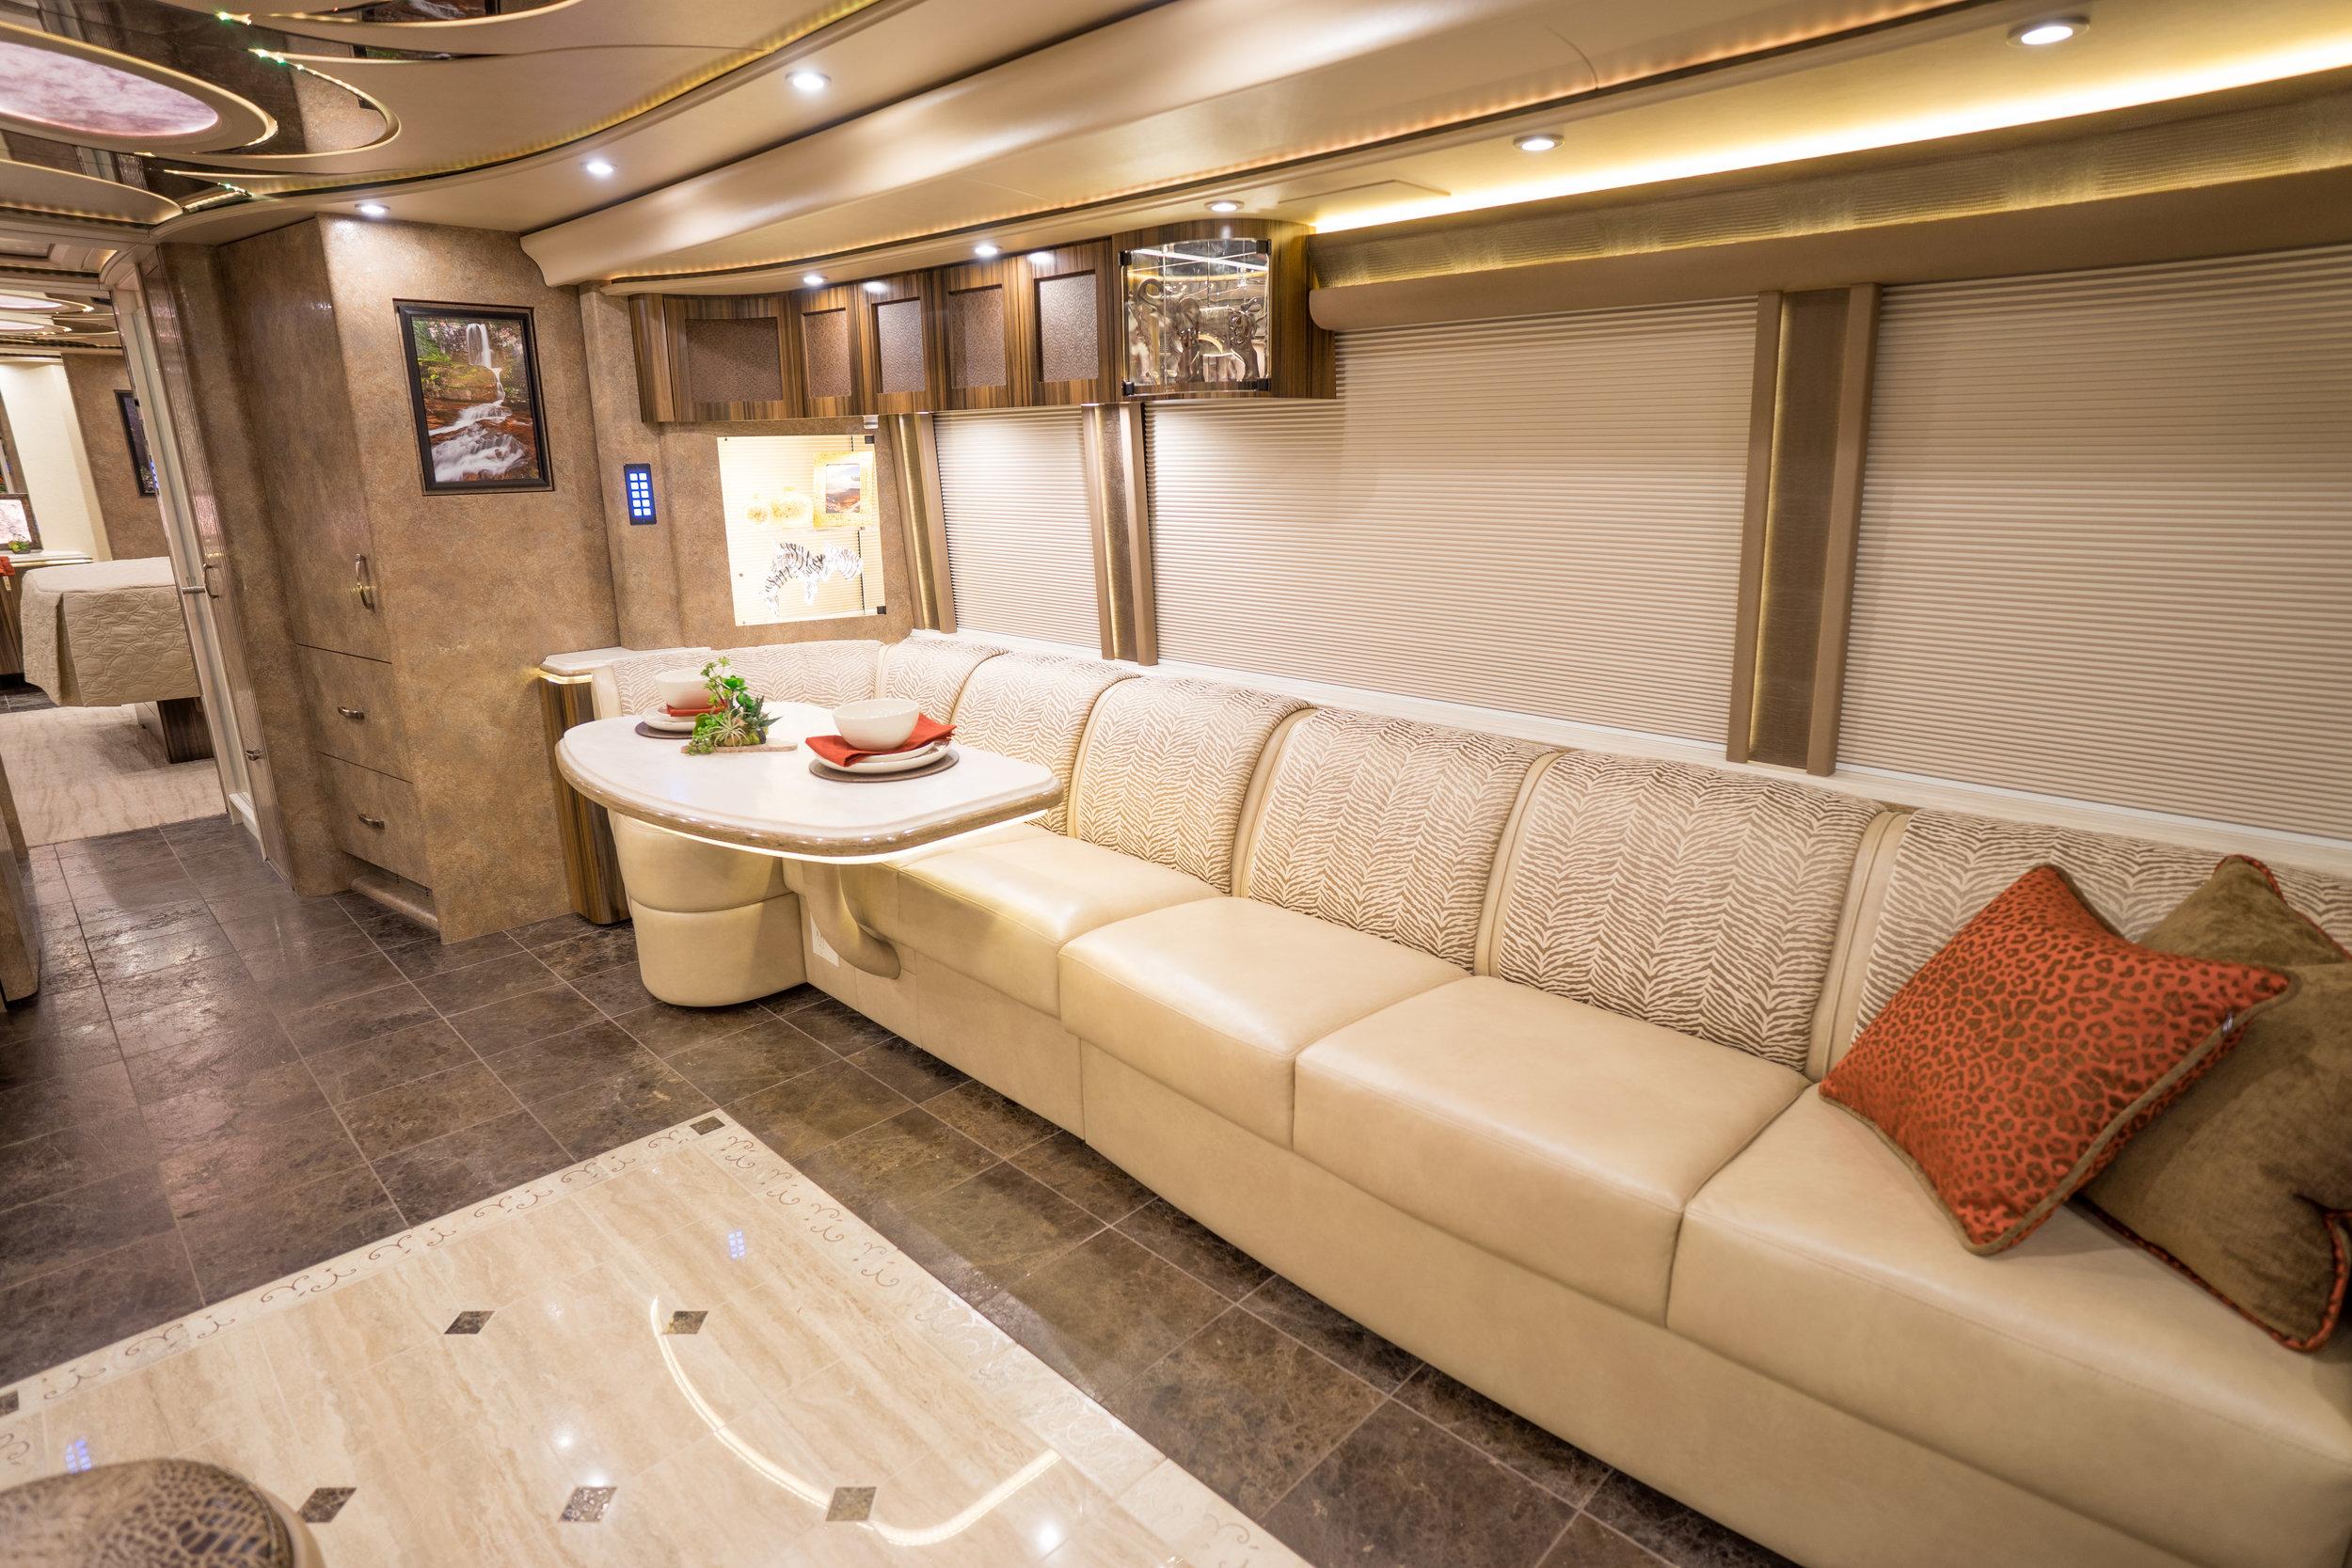 1265-Salon Sofa without Bolster.jpg